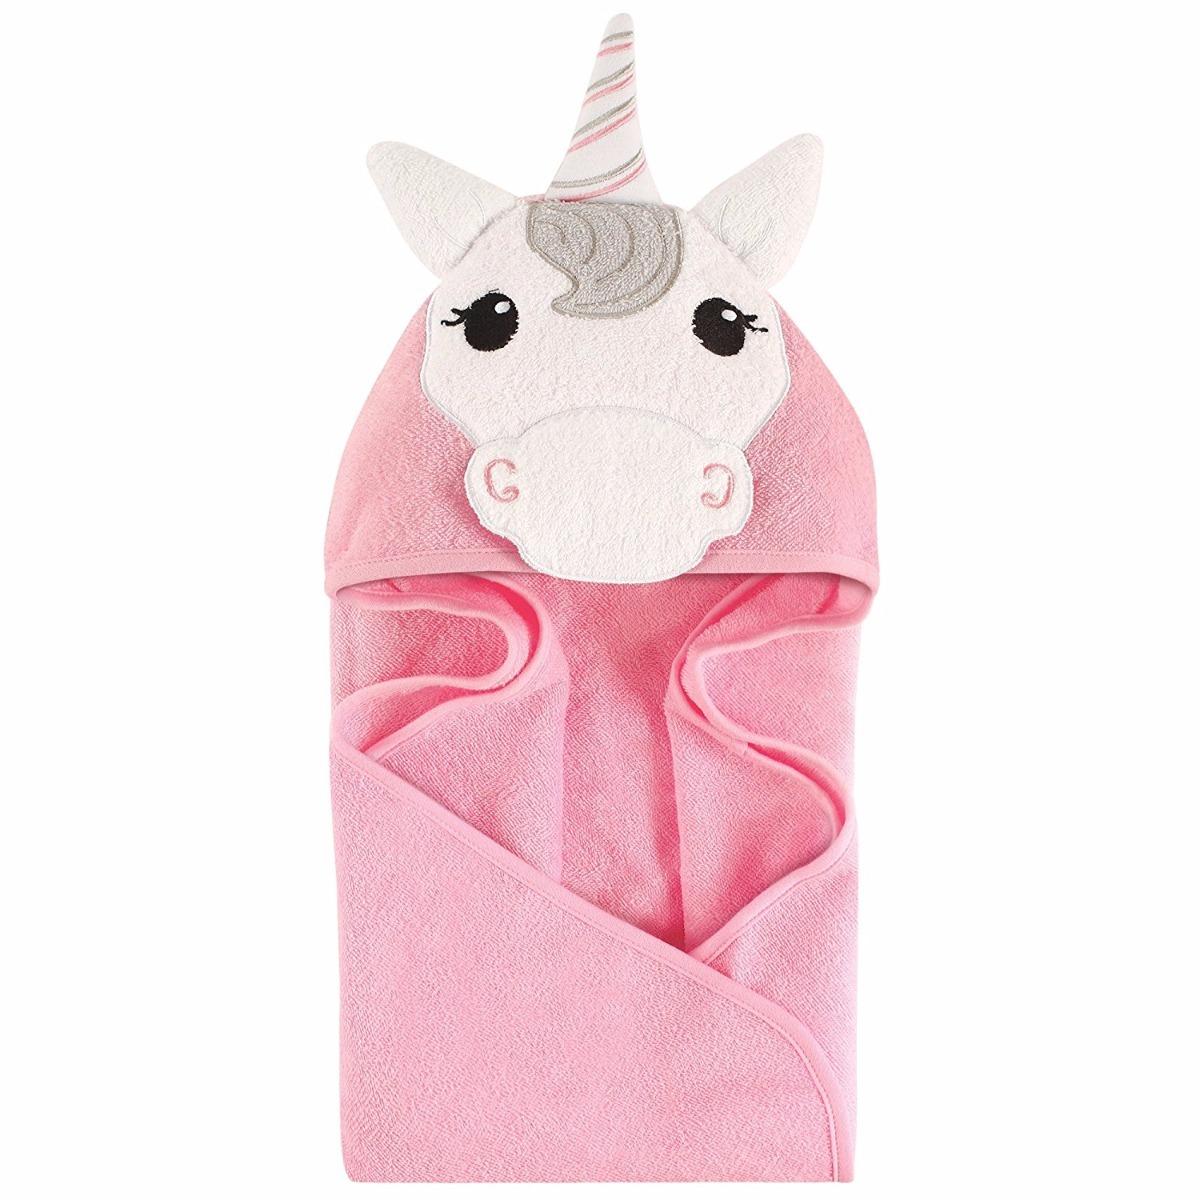 Toalla con capucha para beb unicornio hudson baby 392 - Toalla bano bebe ...